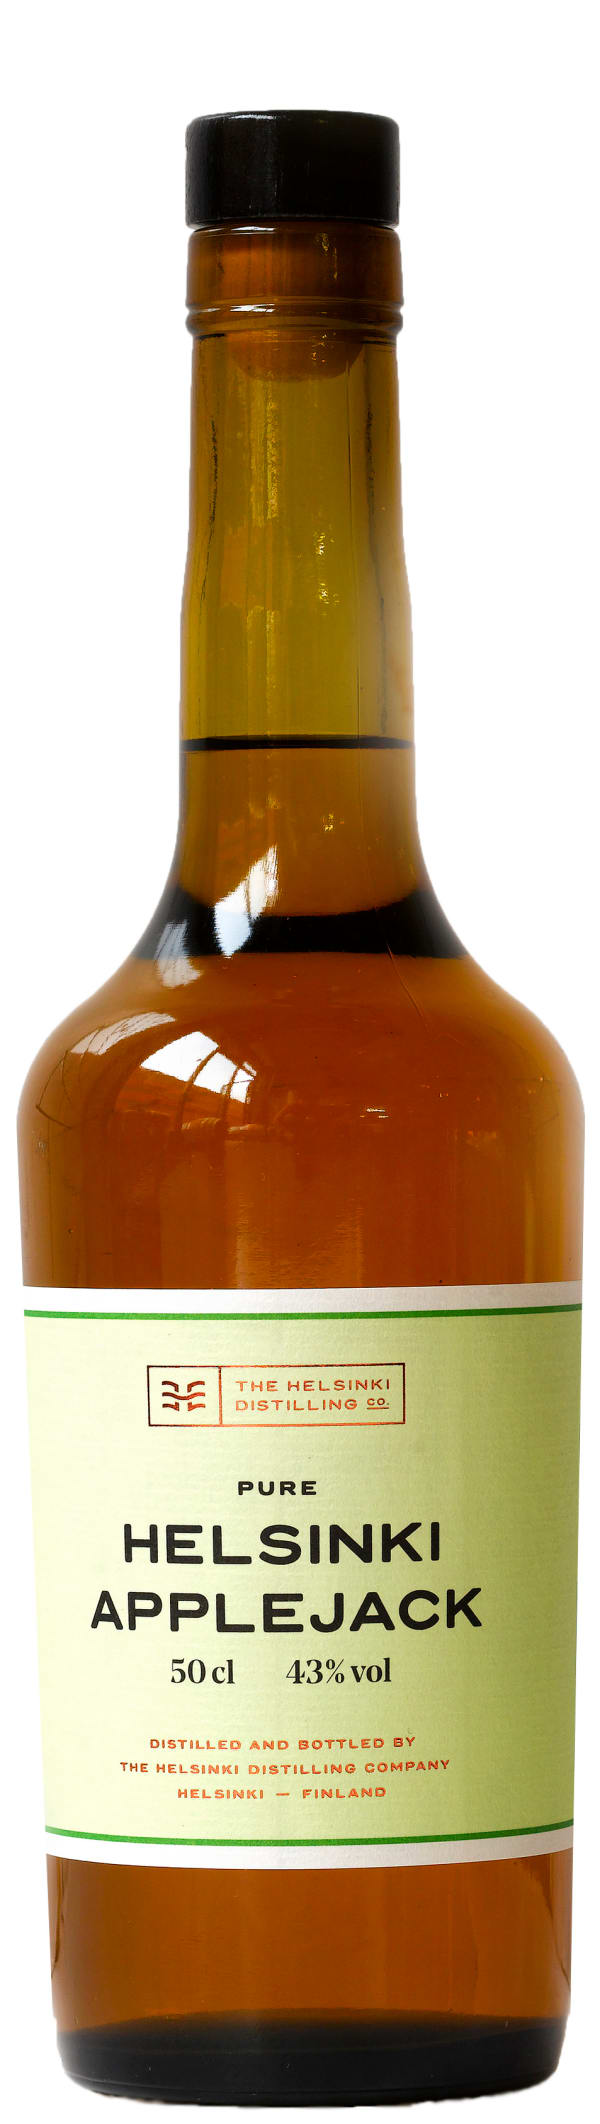 Helsinki Distilling Company Applejack 2016